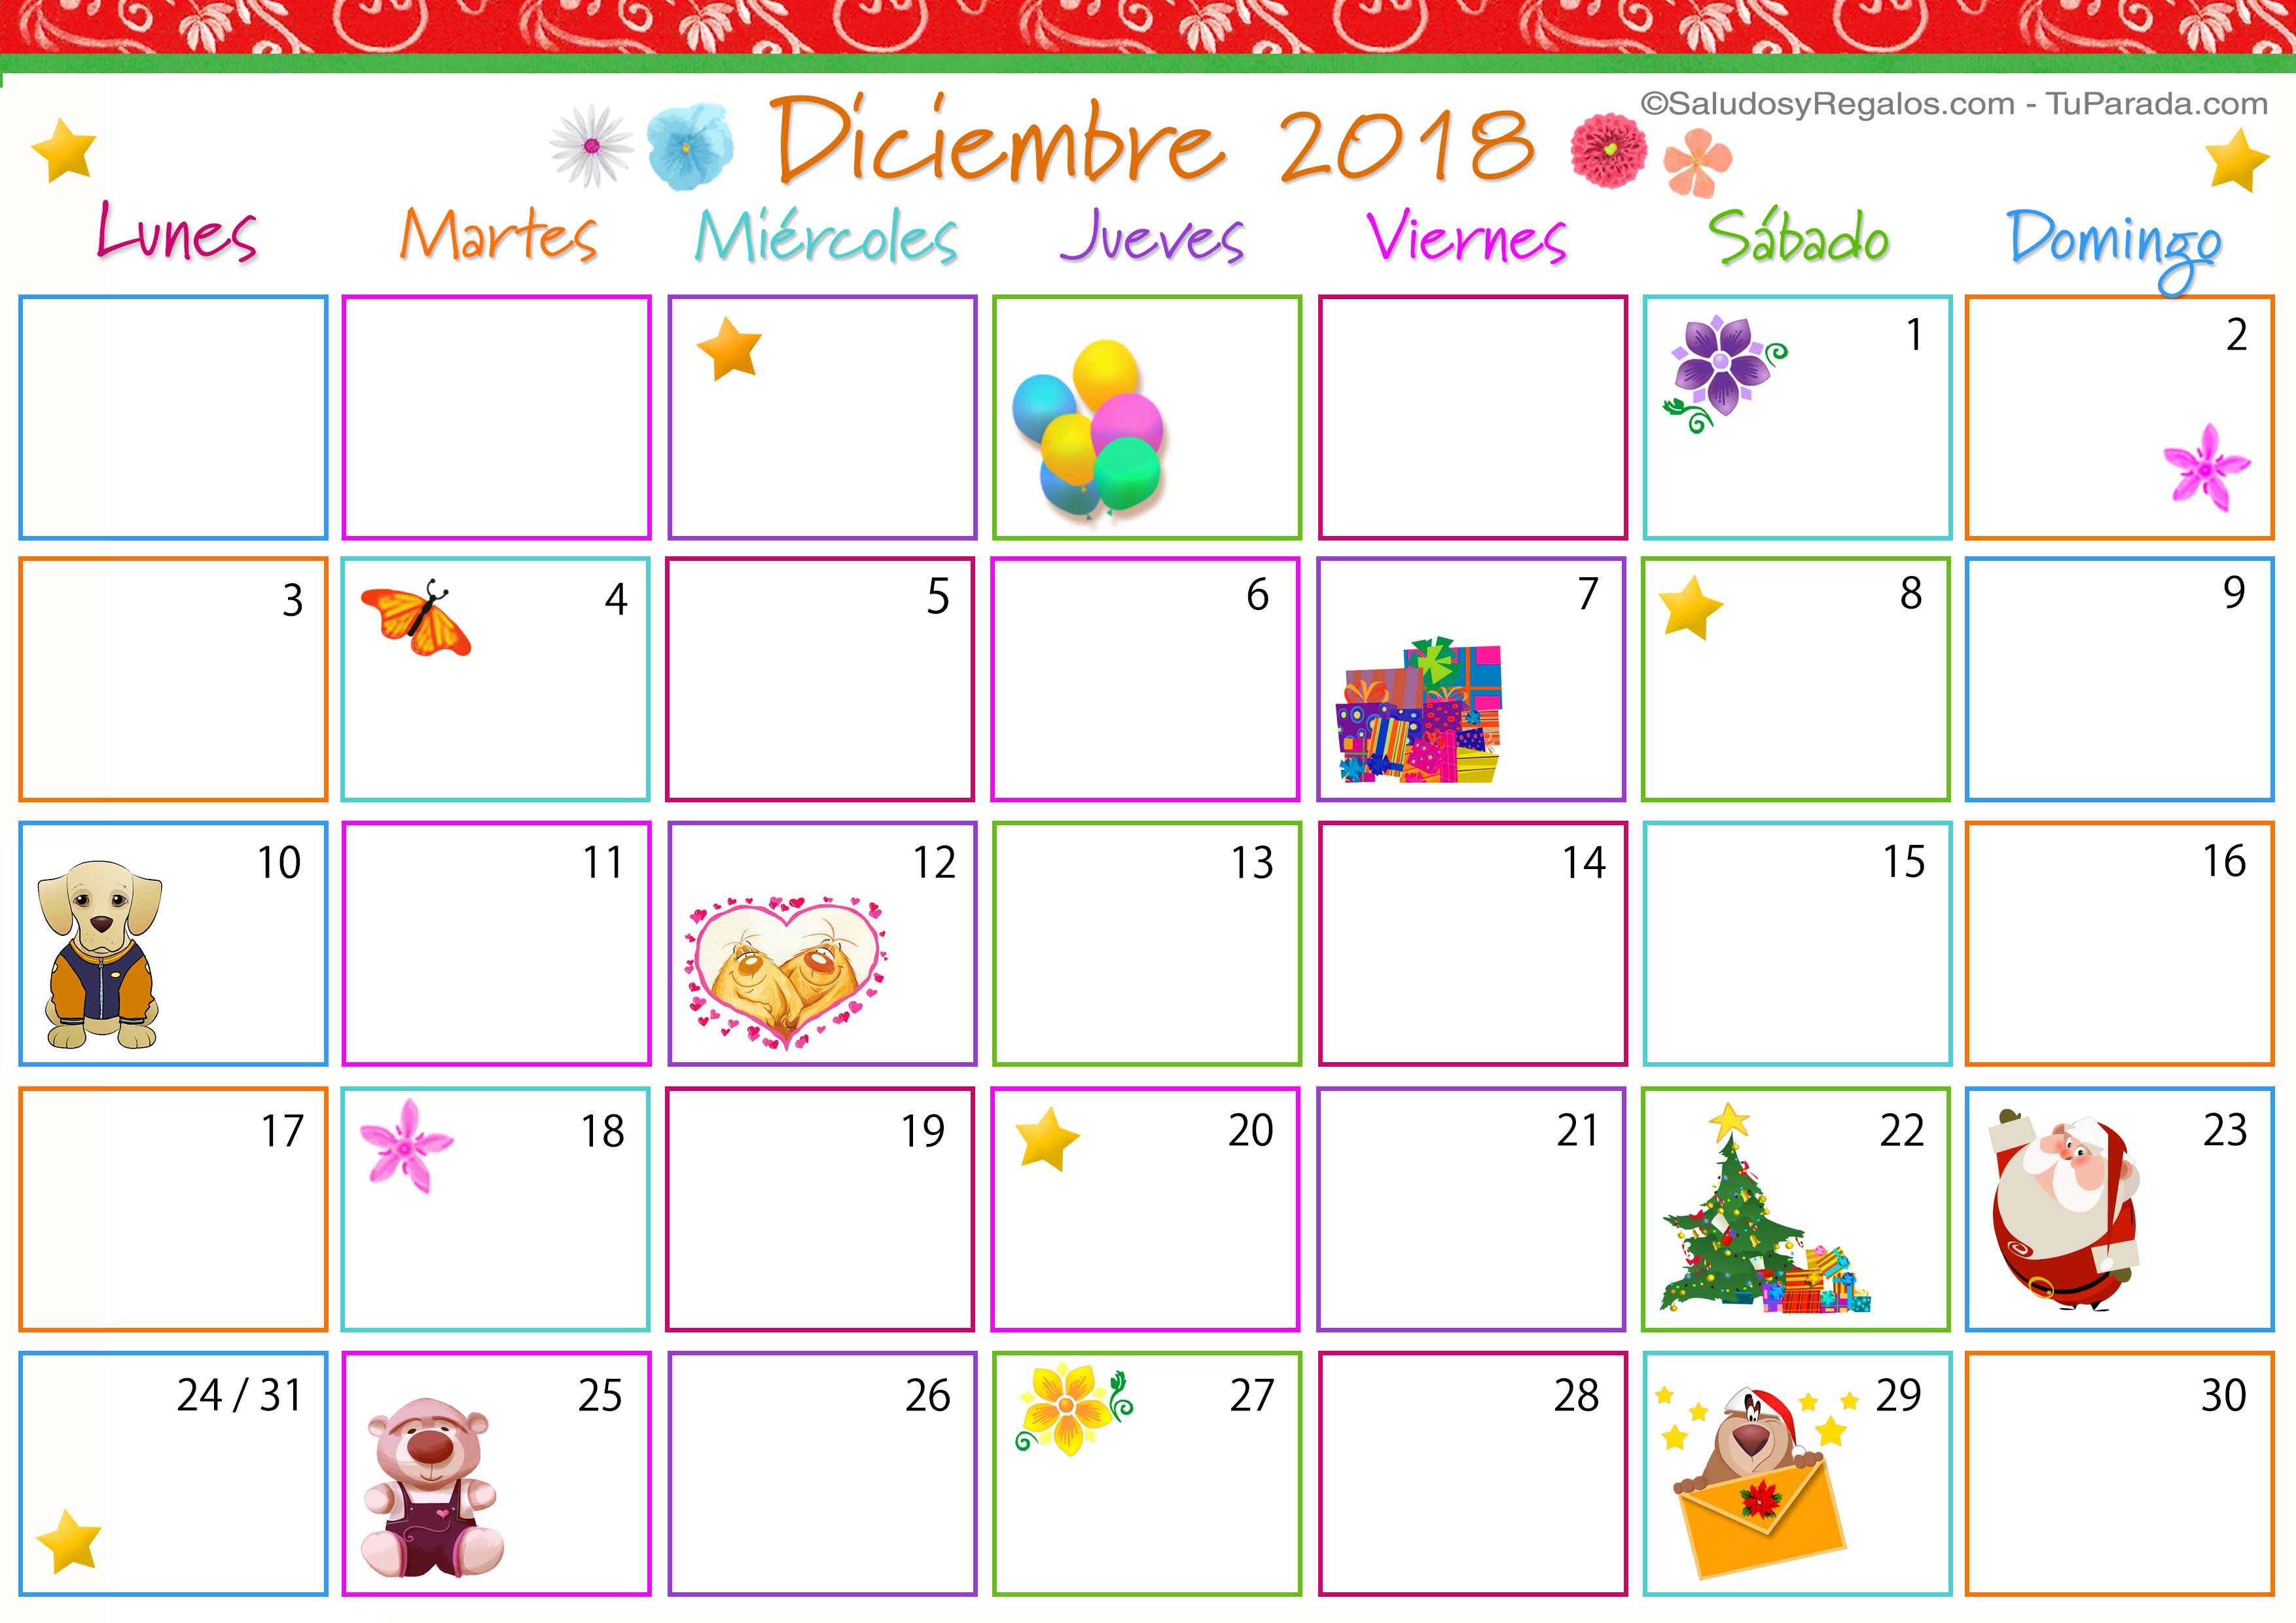 Calendario Diciembre 2018 Argentina.Tarjetas Para Imprimir